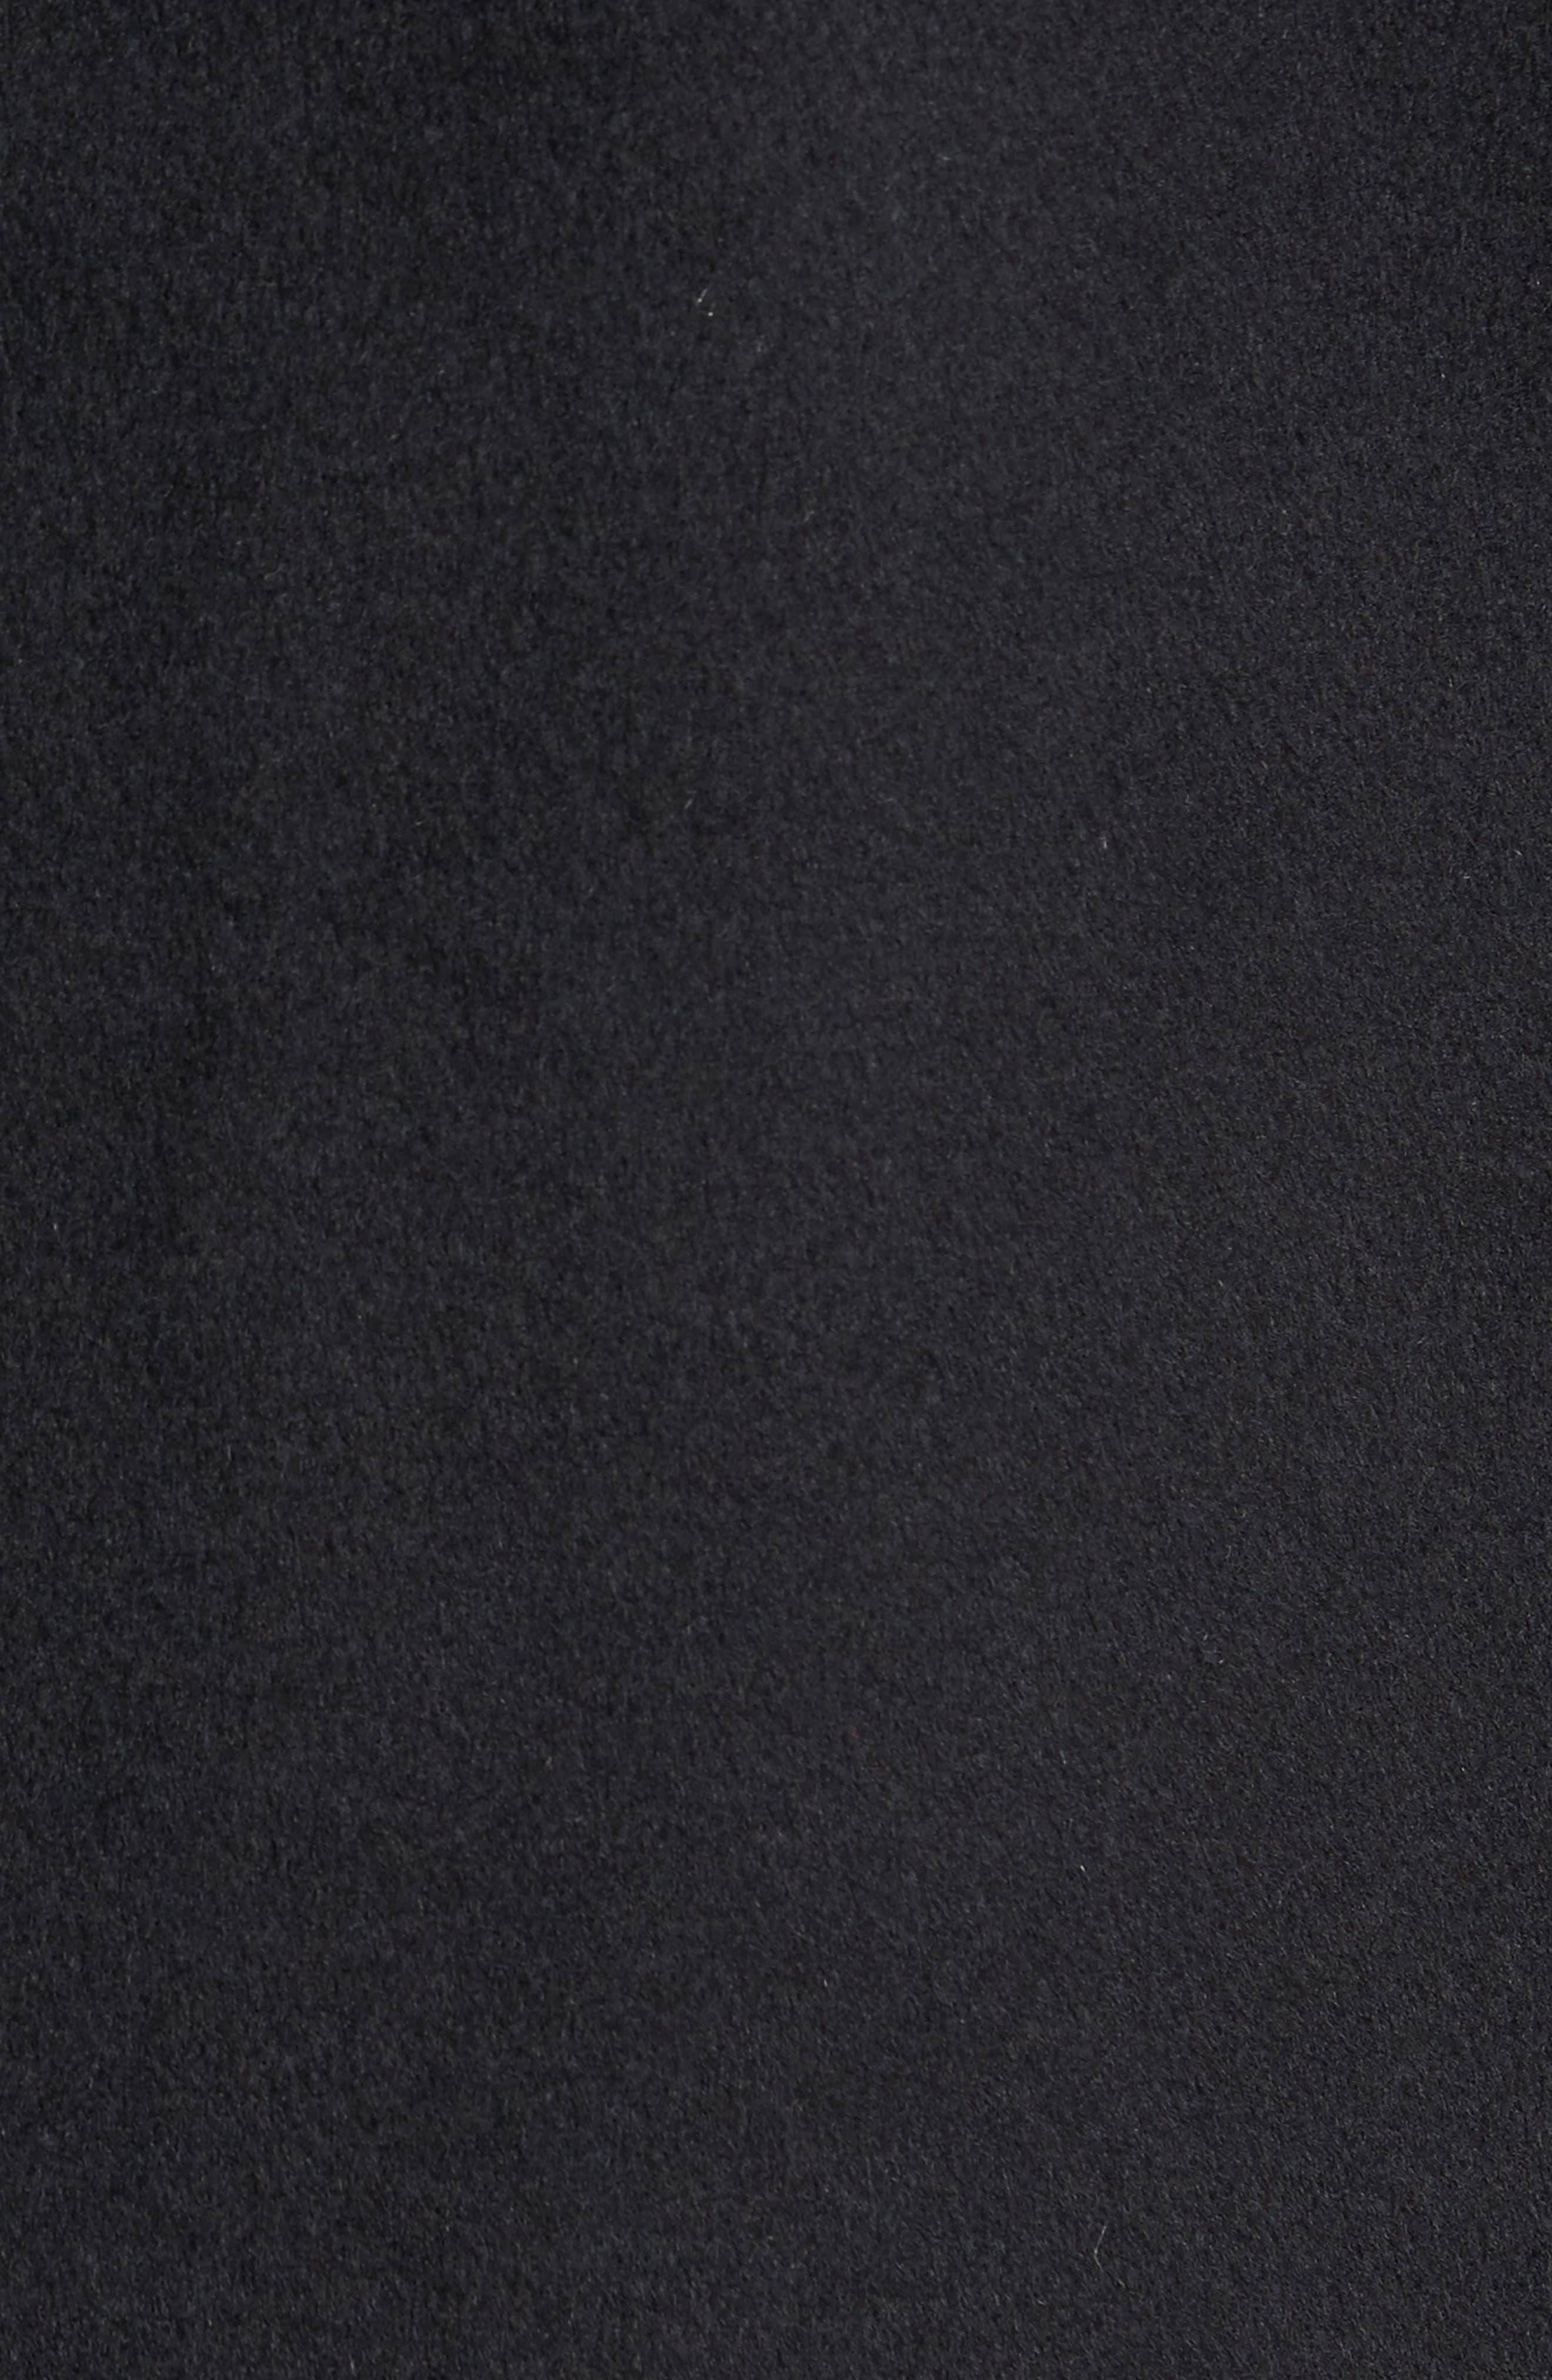 Double Face Wool Blend Car Coat,                             Alternate thumbnail 6, color,                             001